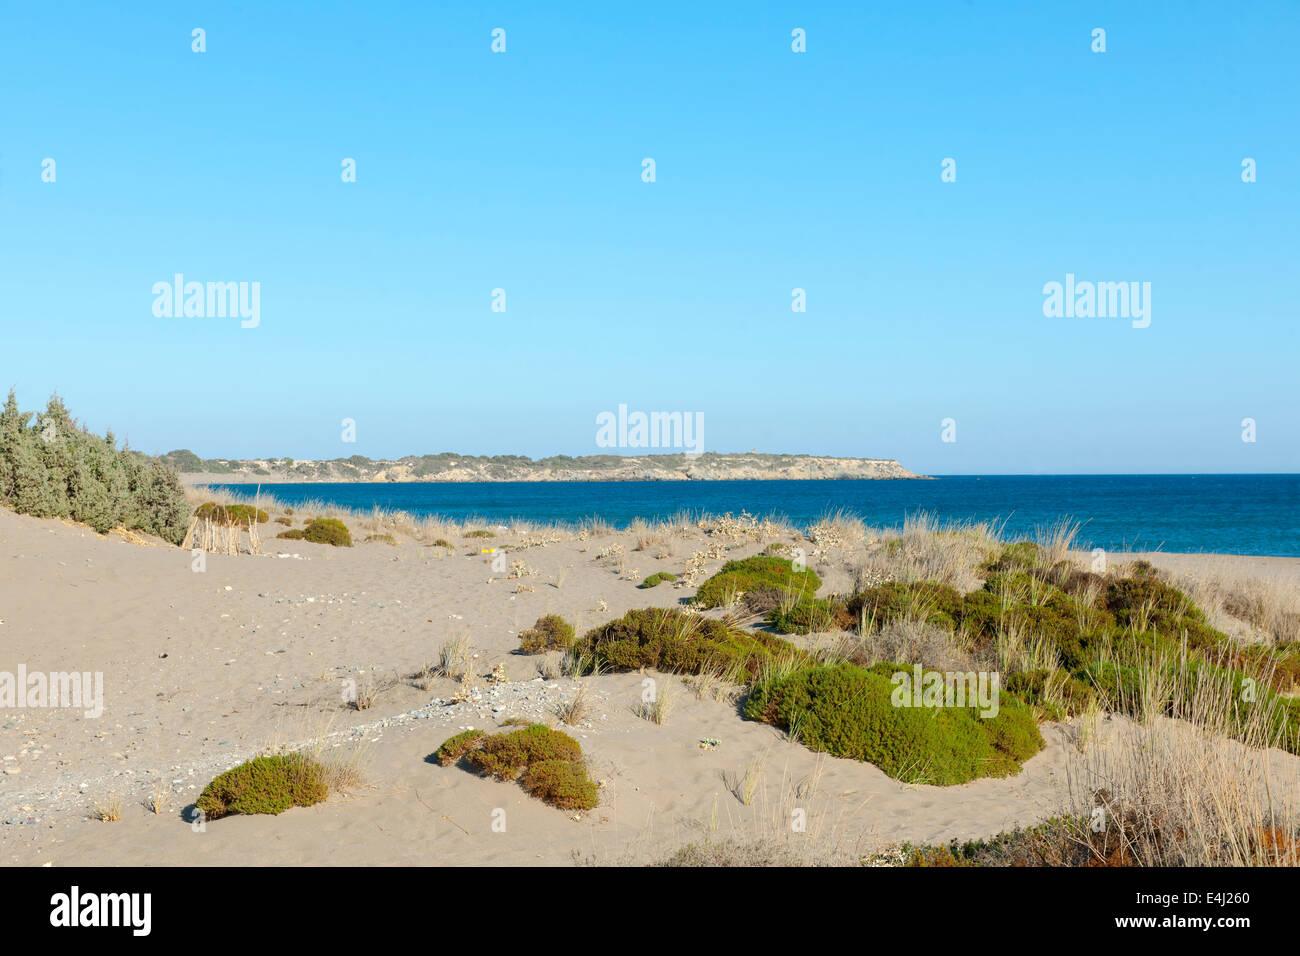 Griechenland, Rhodos, Kattavia, Agios Georgos Strand - Stock Image